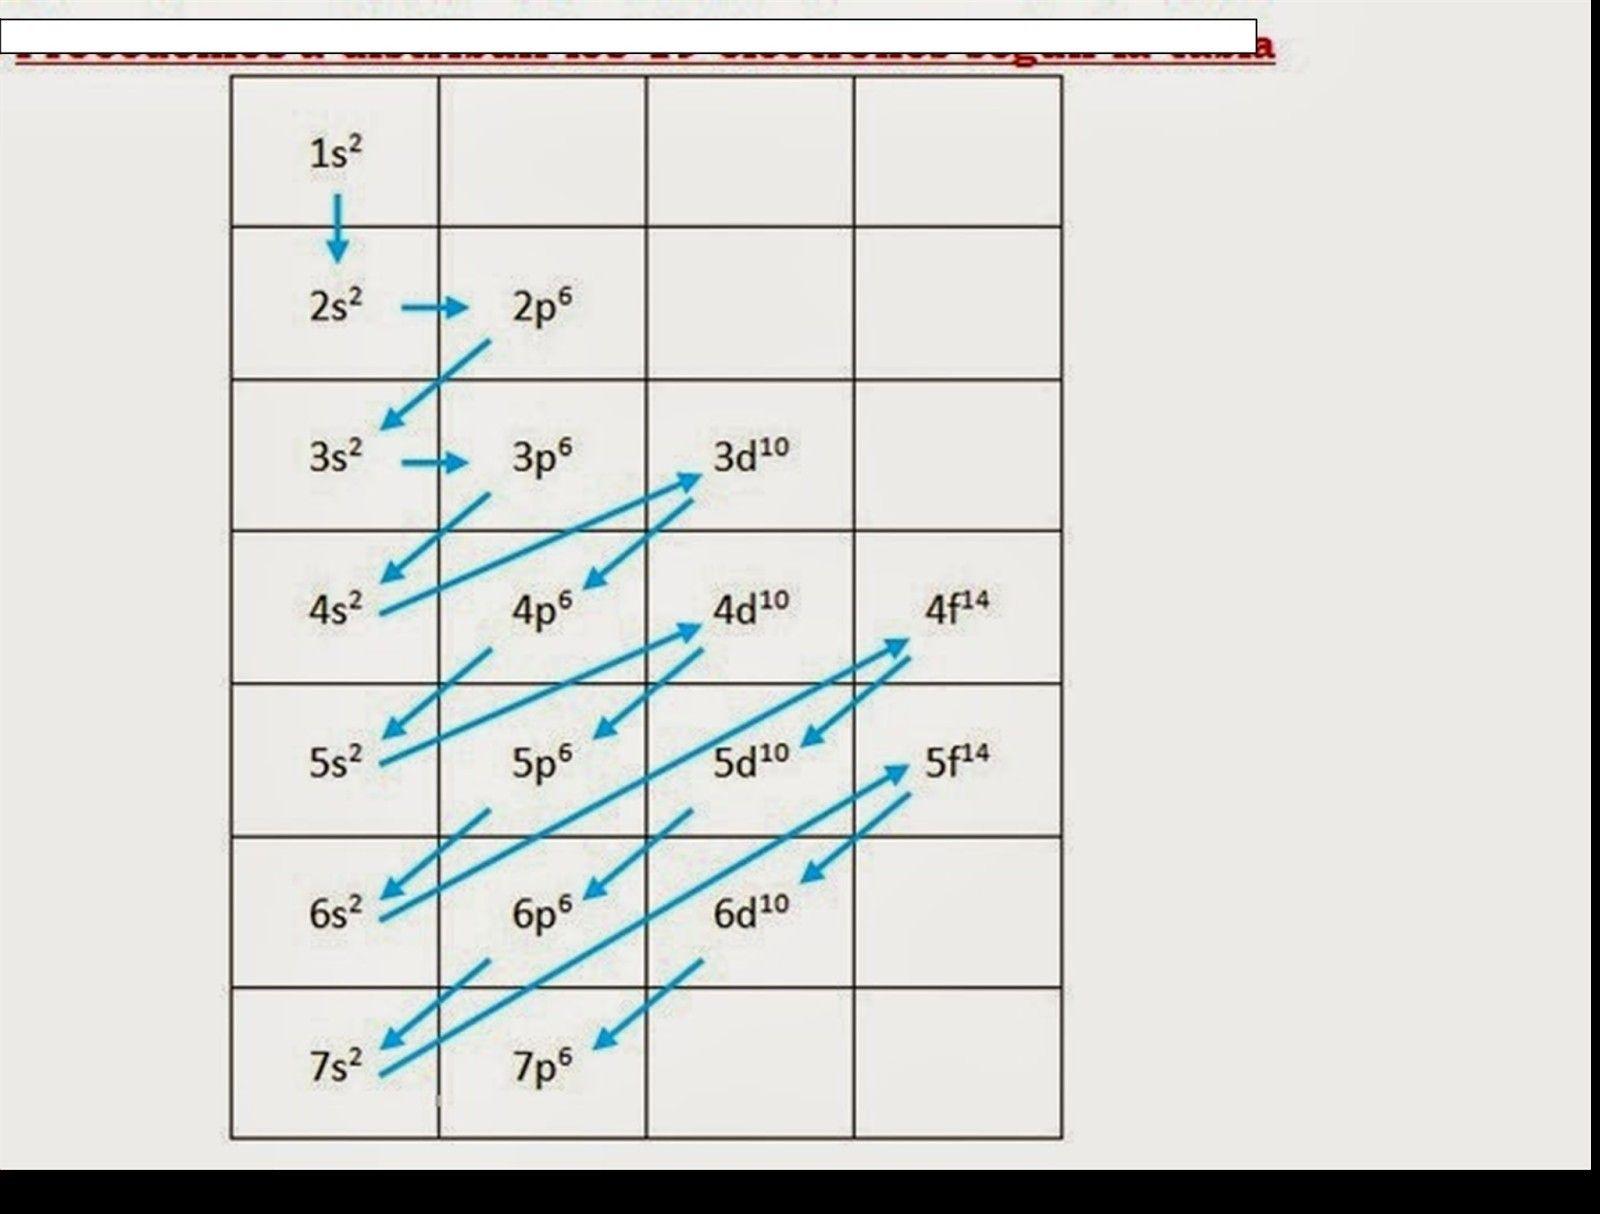 Tabla periodica kernel new tabla periodica metales no metales y tabla periodica kernel new tabla periodica metales no metales y metaloides gases nobles copy urtaz Image collections